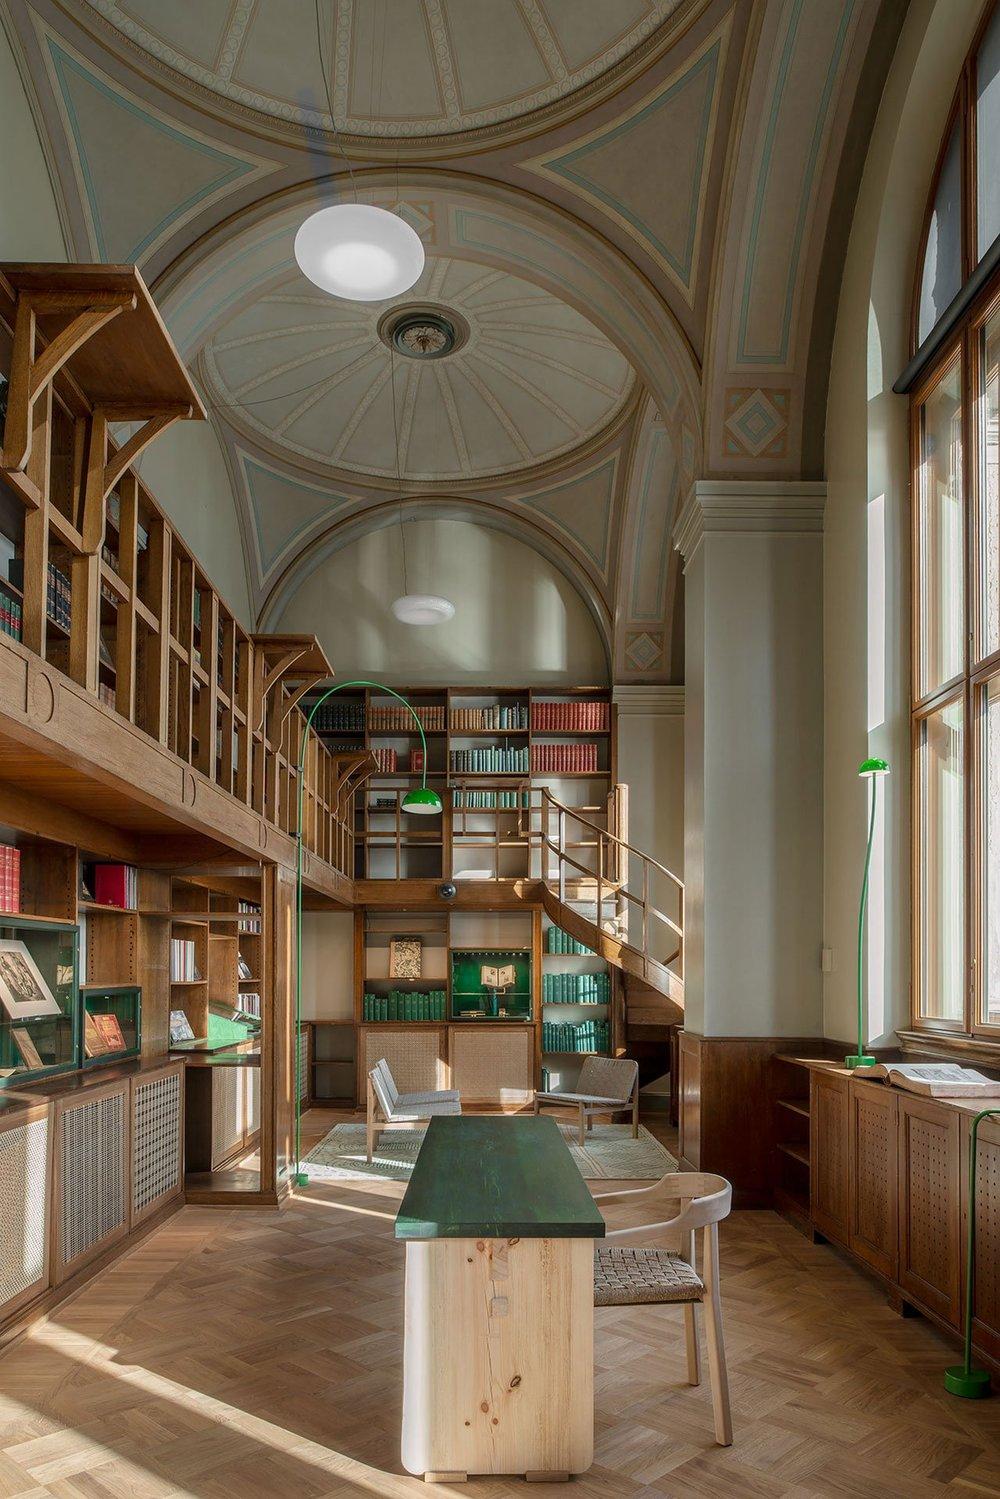 f22_nm_en_ny_samling_restaurant_nationalmuseum_stockholm_sweden_yatzer.jpg